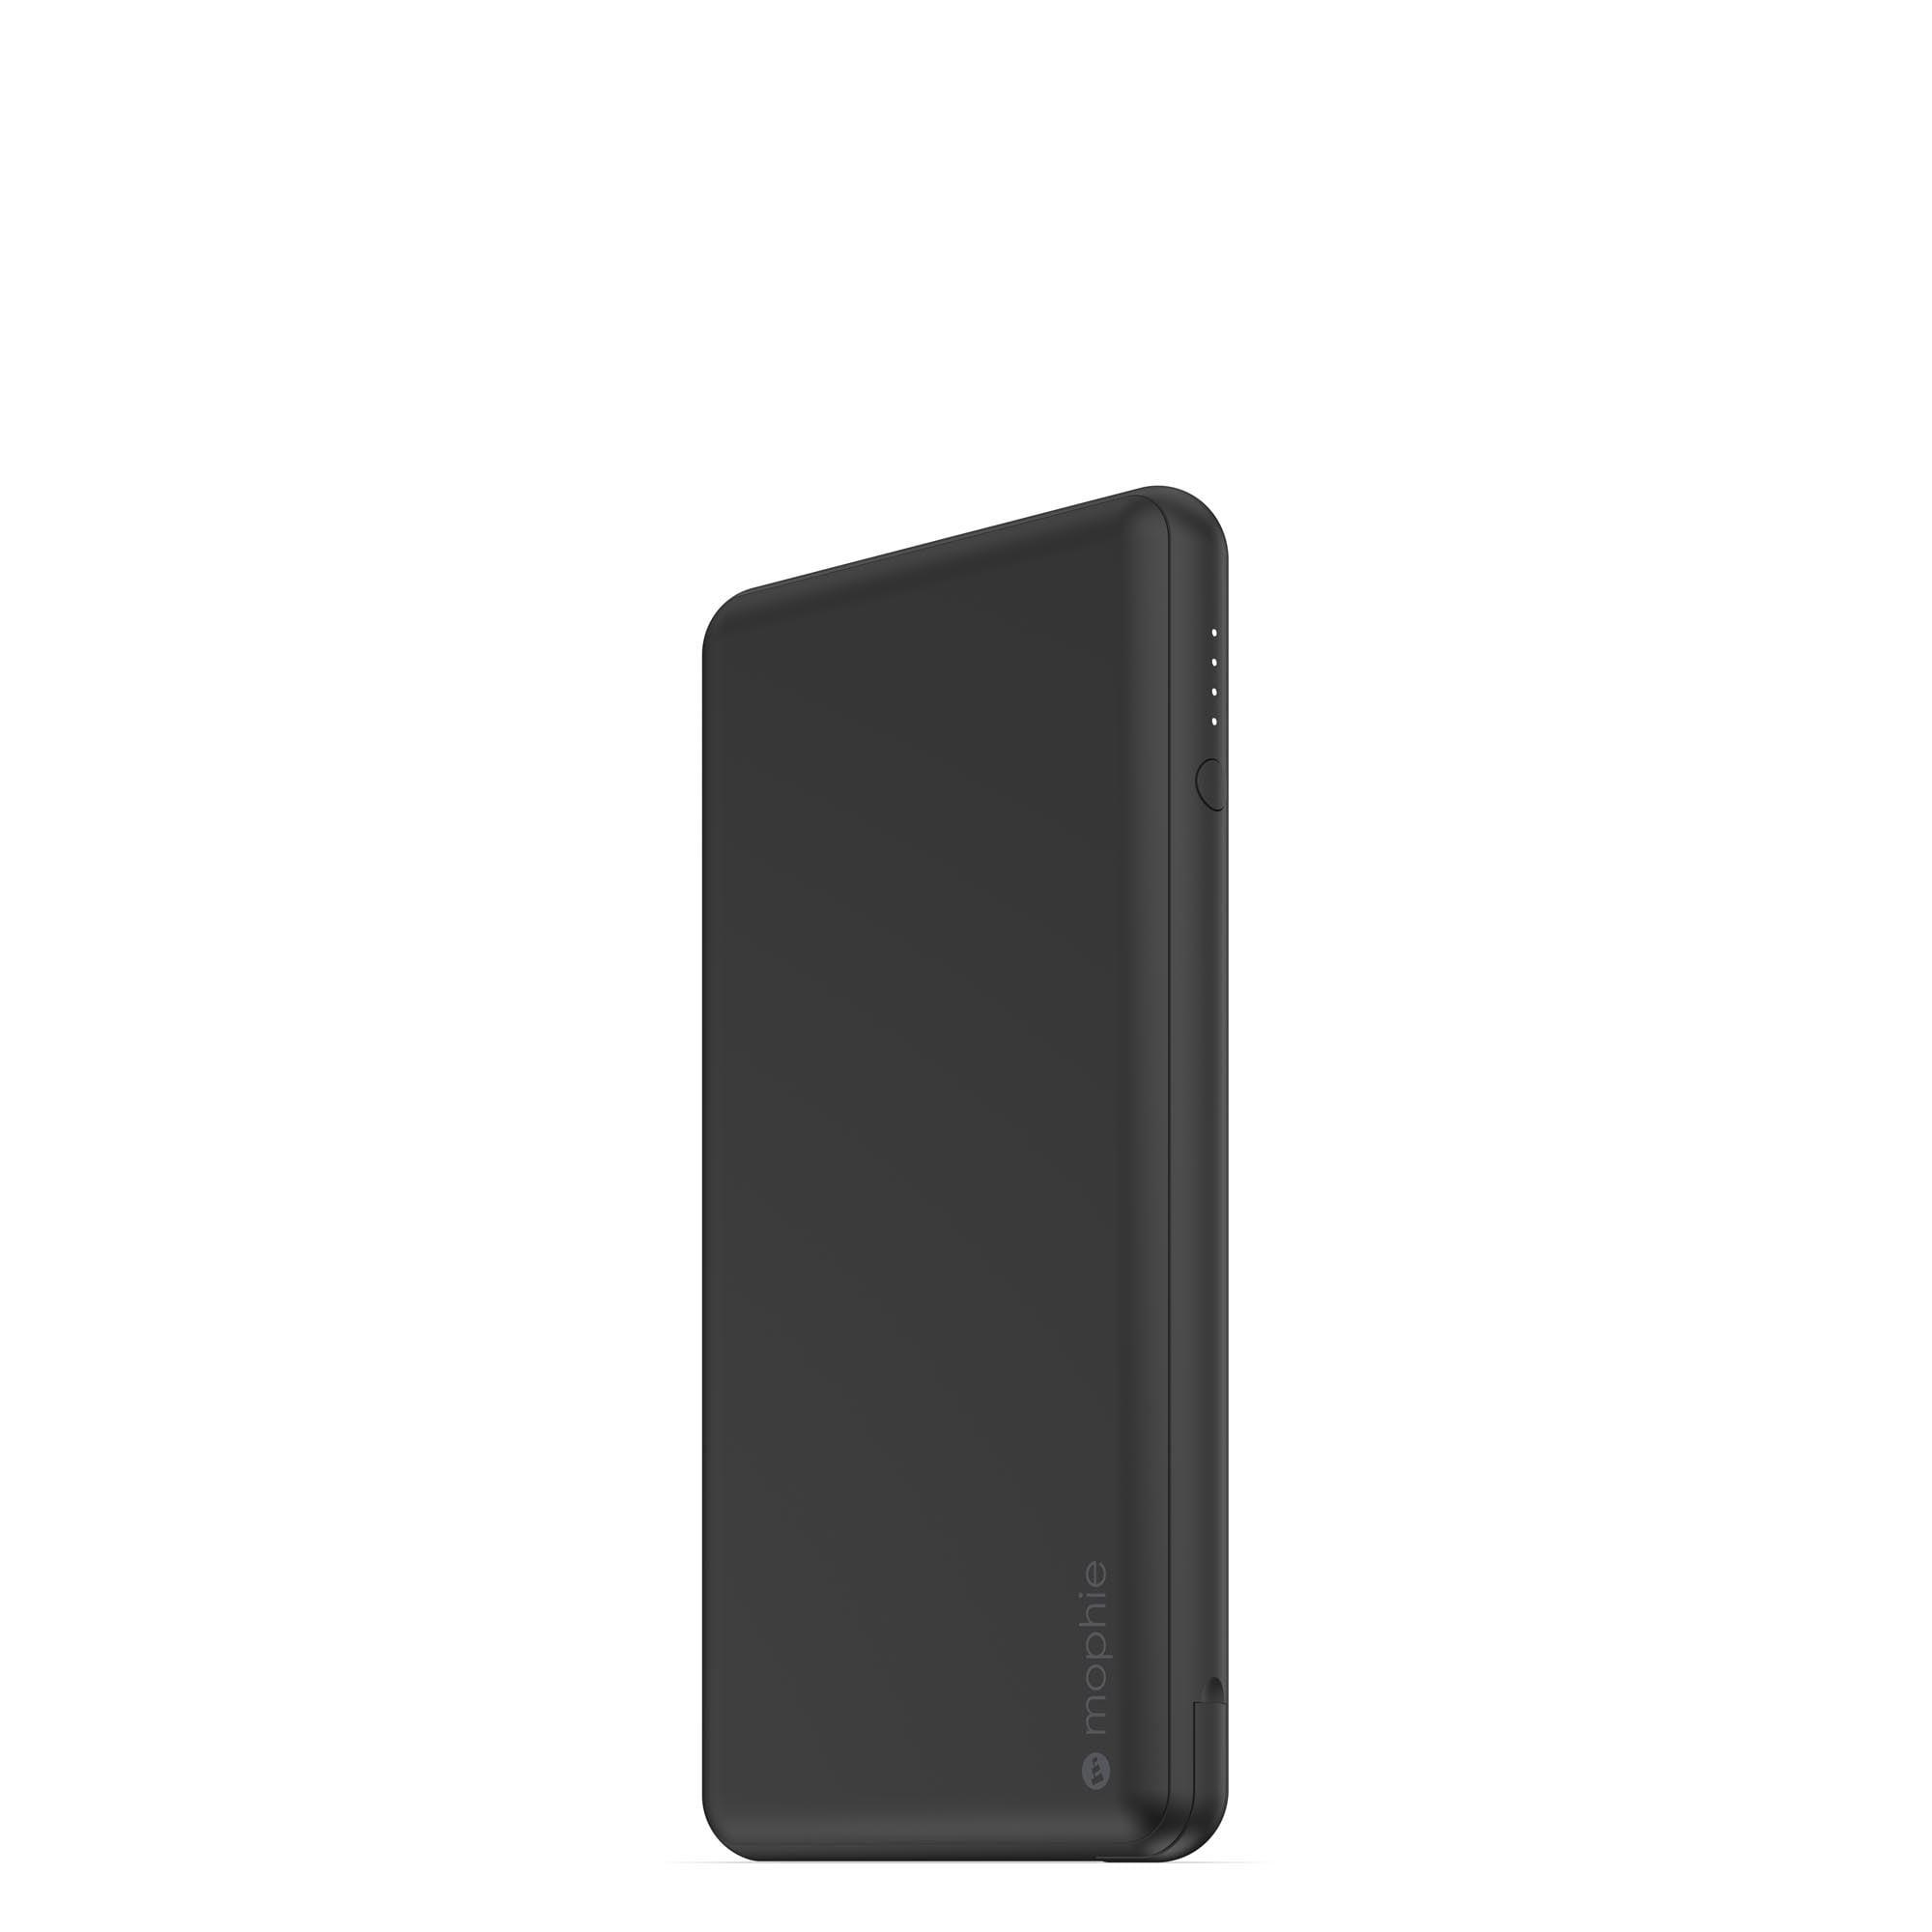 new concept 9da30 690ec Mophie 12,000mAh Powerstation Plus XL USB Type-C Power Bank, Black